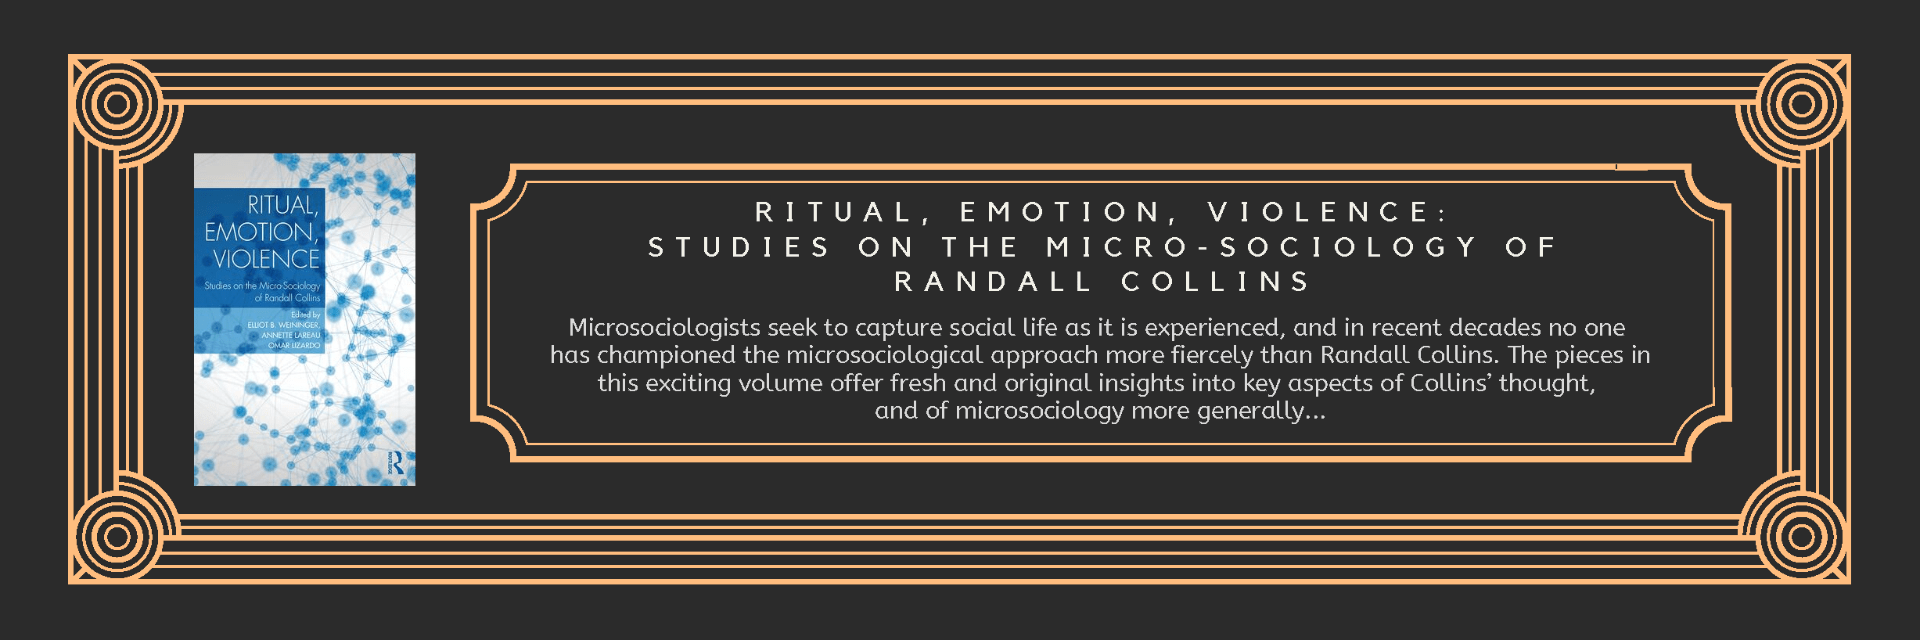 Book Ritual Emotion Violence